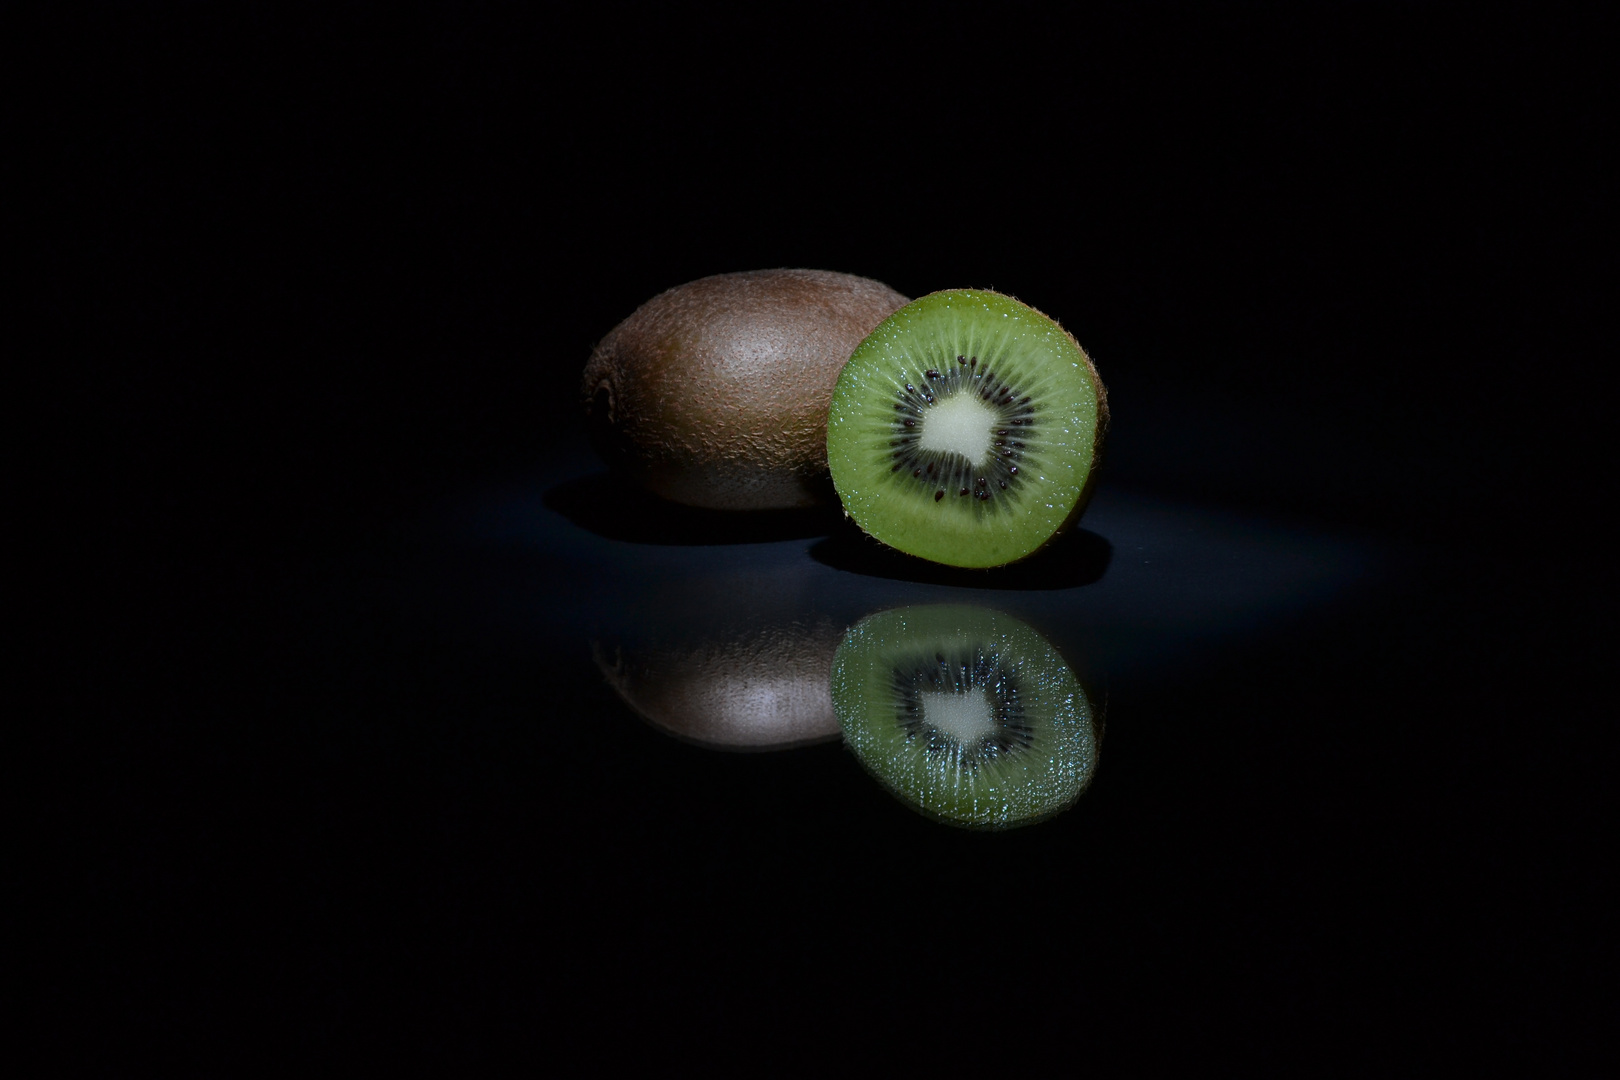 fruchtige Experimente